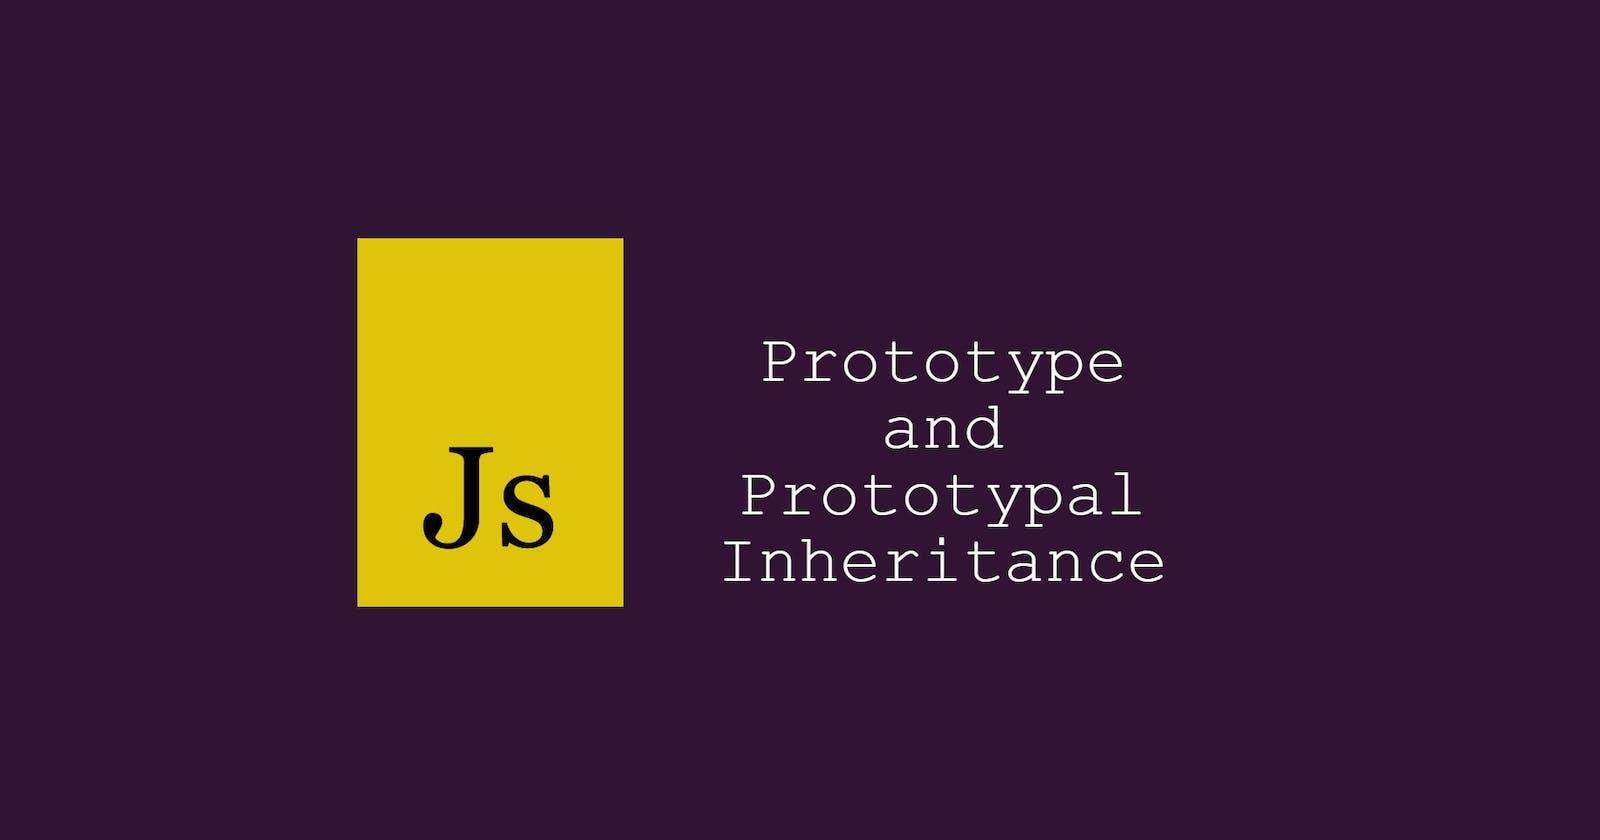 Prototype and prototypal inheritance